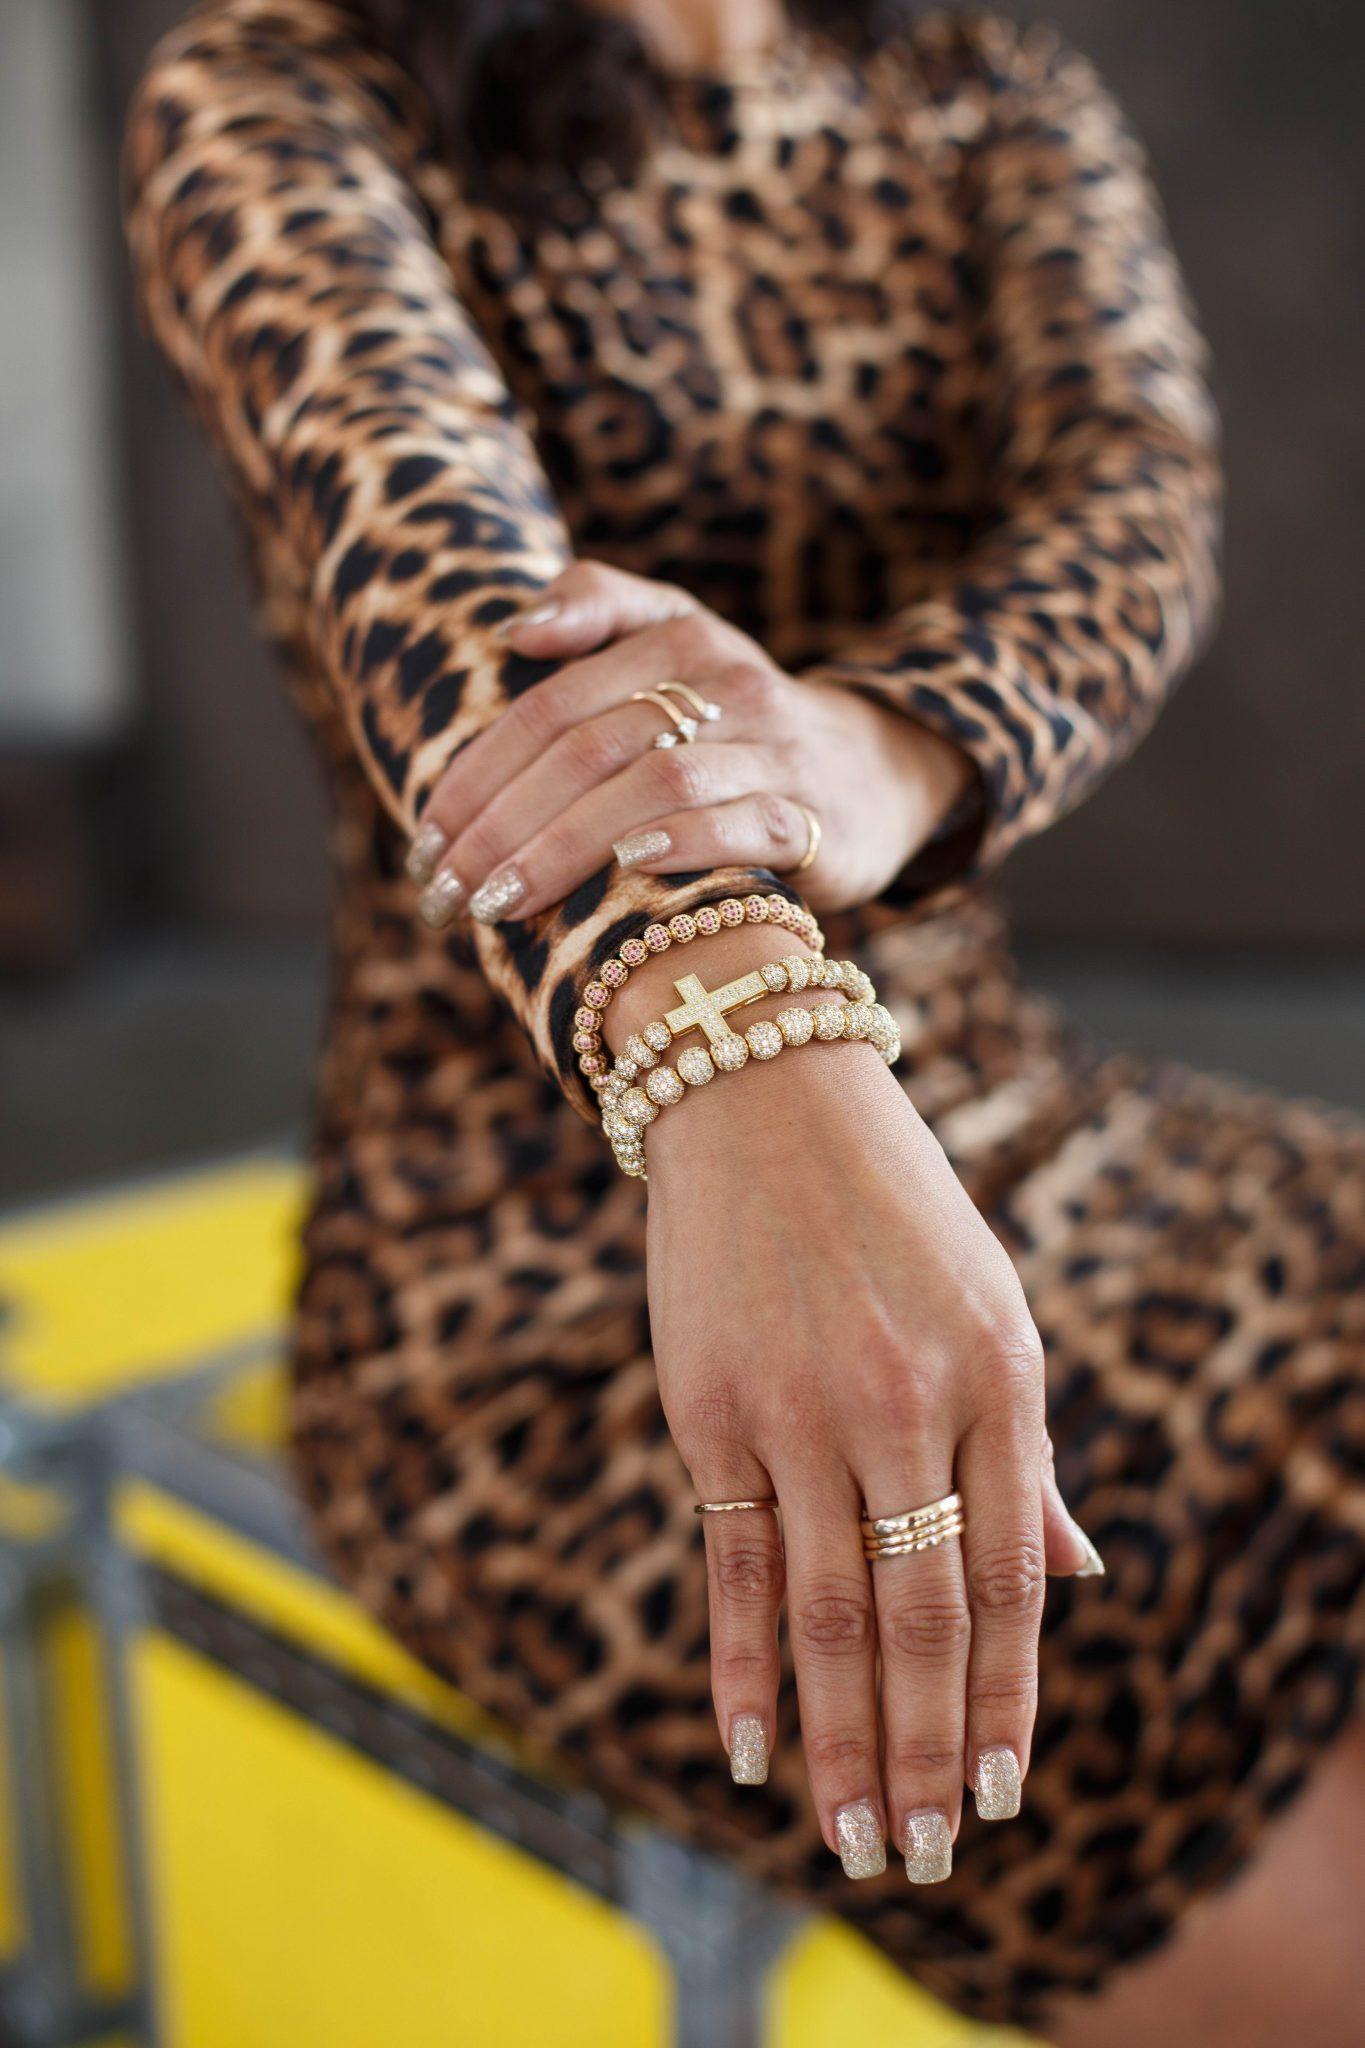 Look 3: Interview  Dress: Aqua Heels: Schutz  Earrings & Bracelets: Love and Mercy